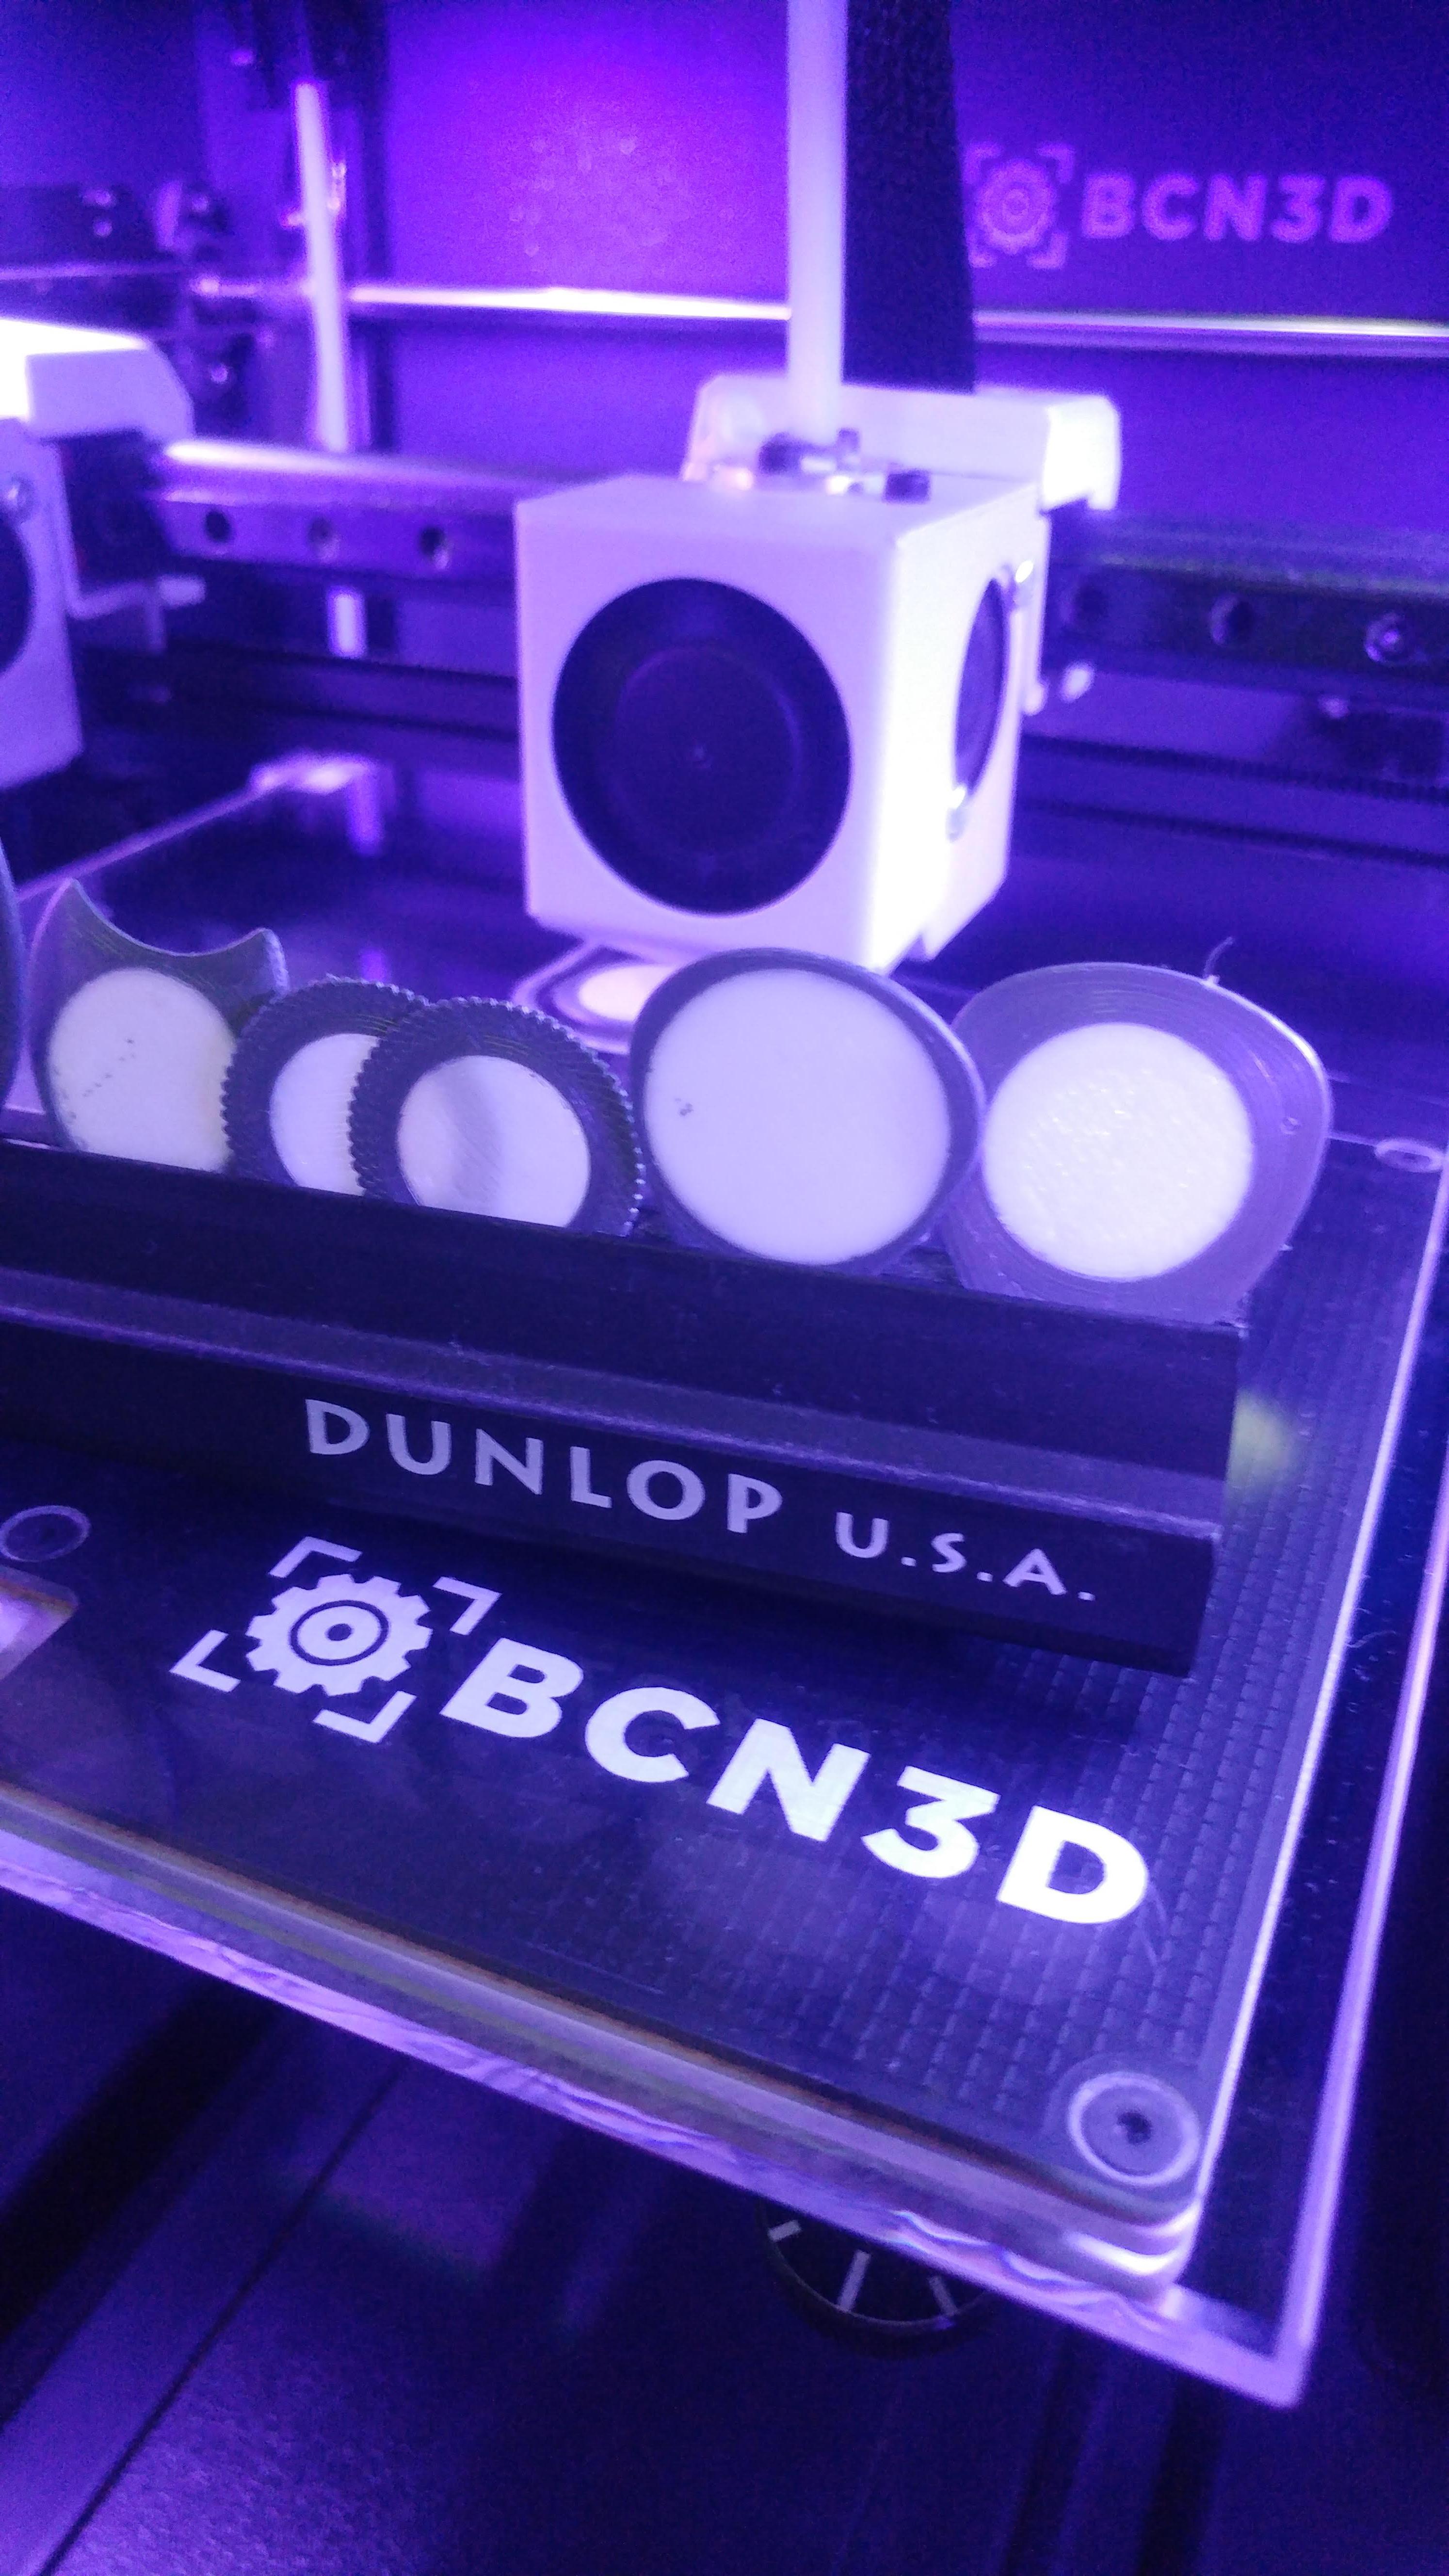 21E7B456-7AD2-4758-BBE2-5666905DCF3F.jpeg Download free STL file UNU-TRI Pua Nido (Nest Pick Guitar) • 3D printing model, carleslluisar